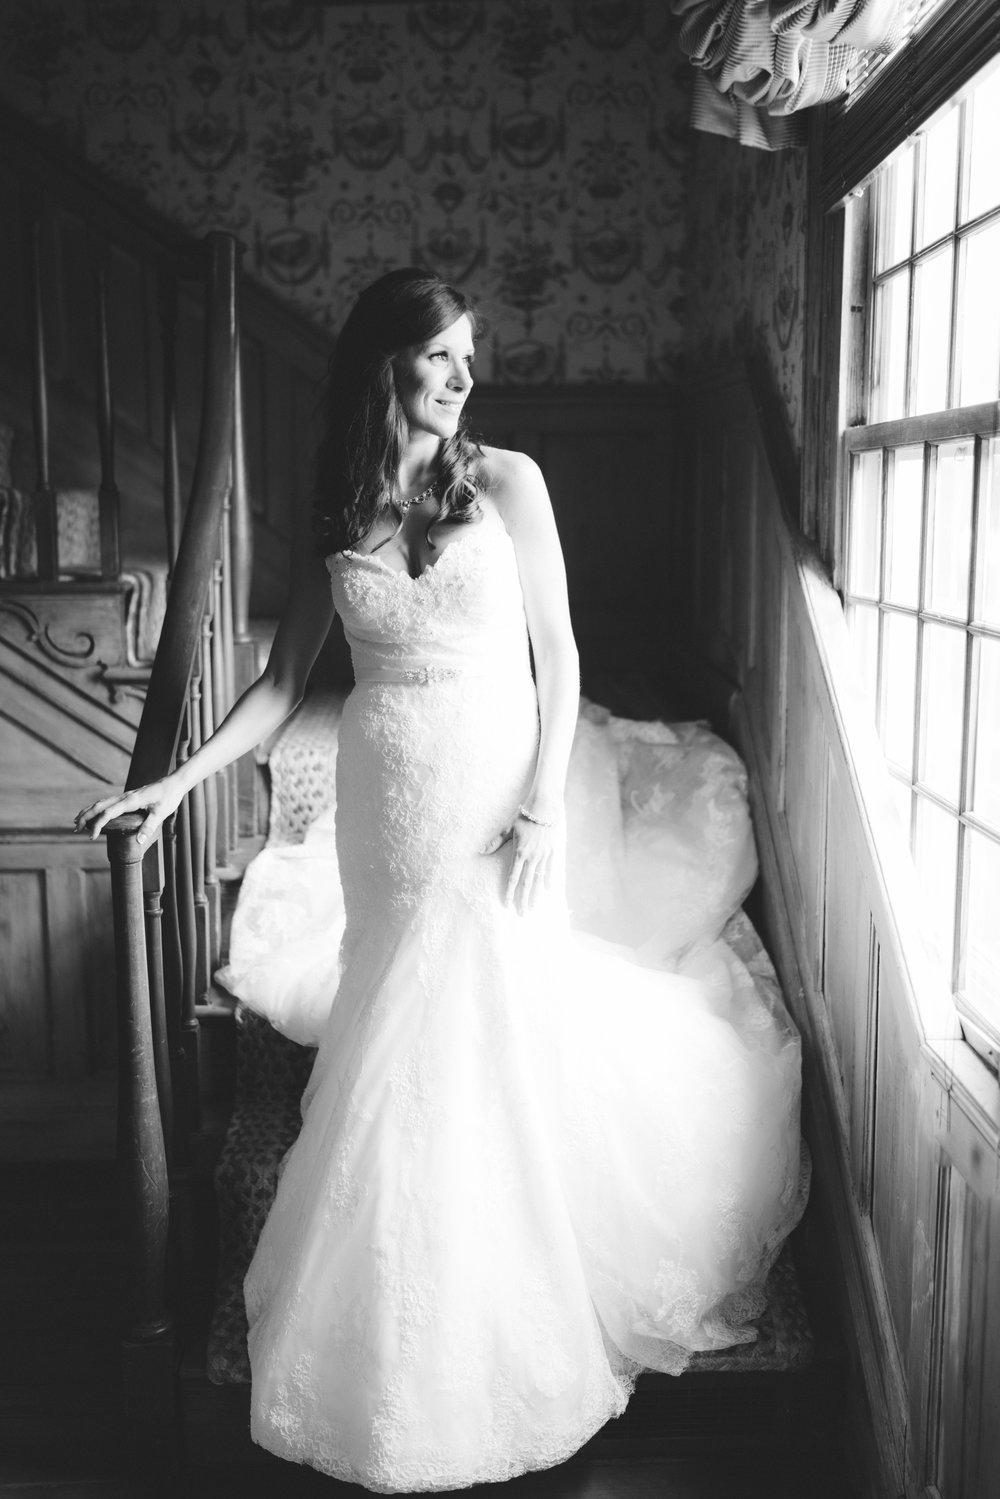 Mike_Steinmetz_Virginia_Wedding_Photographer_Favorites-33.jpg